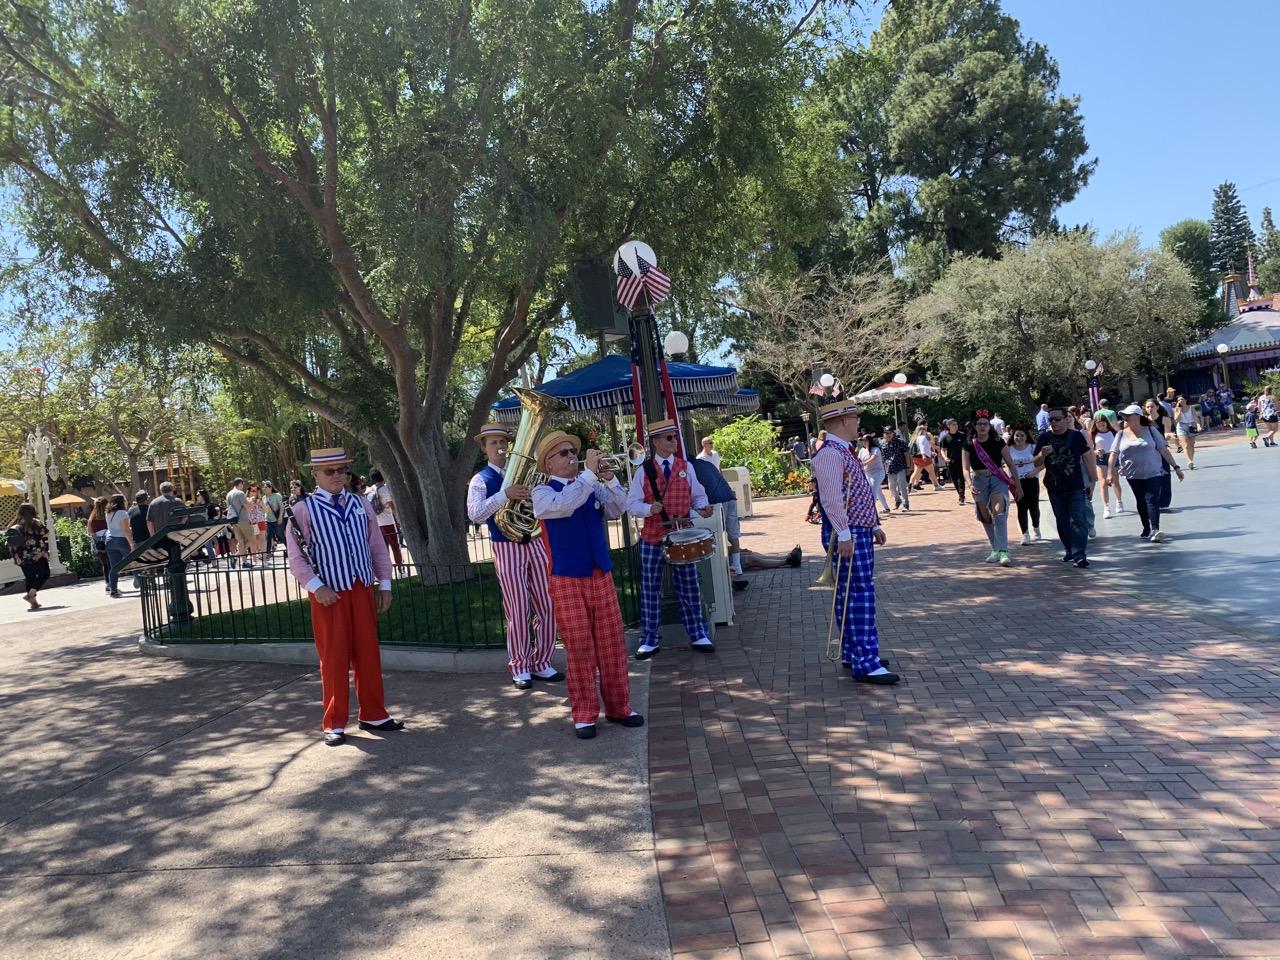 disneyland trip report june 2019 part 3 16 straw hatters.jpeg